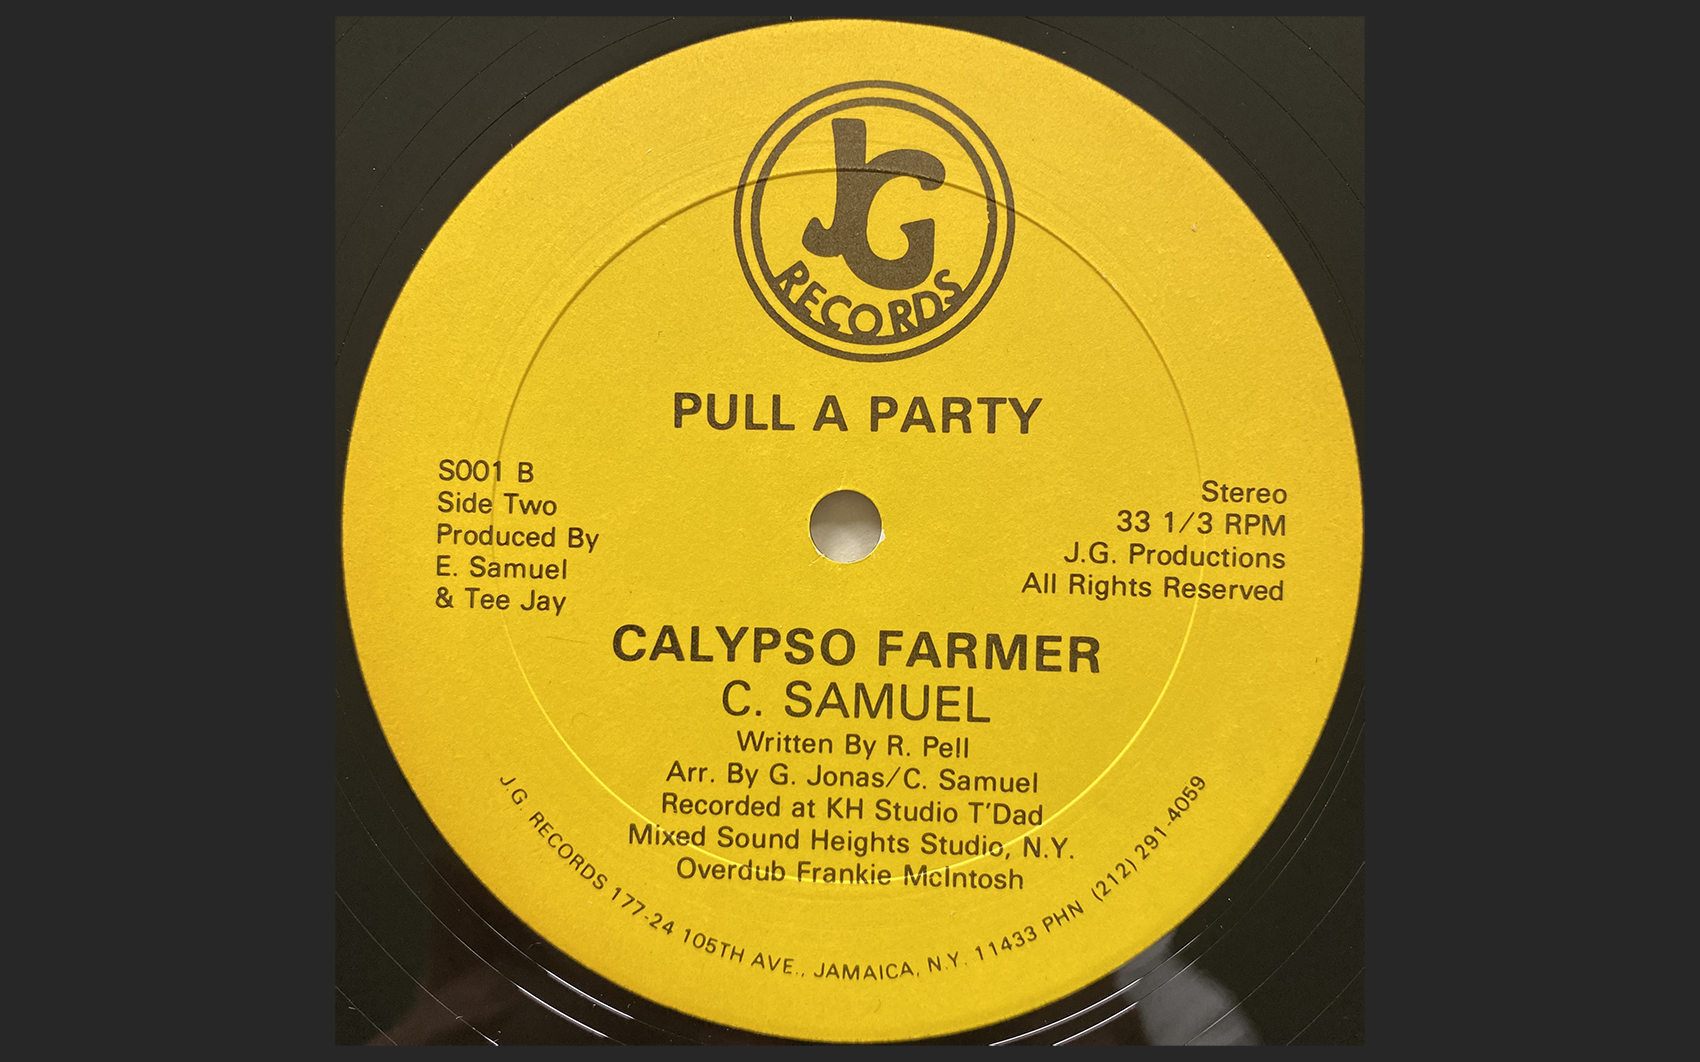 Calypso Farmer - Pull a Party